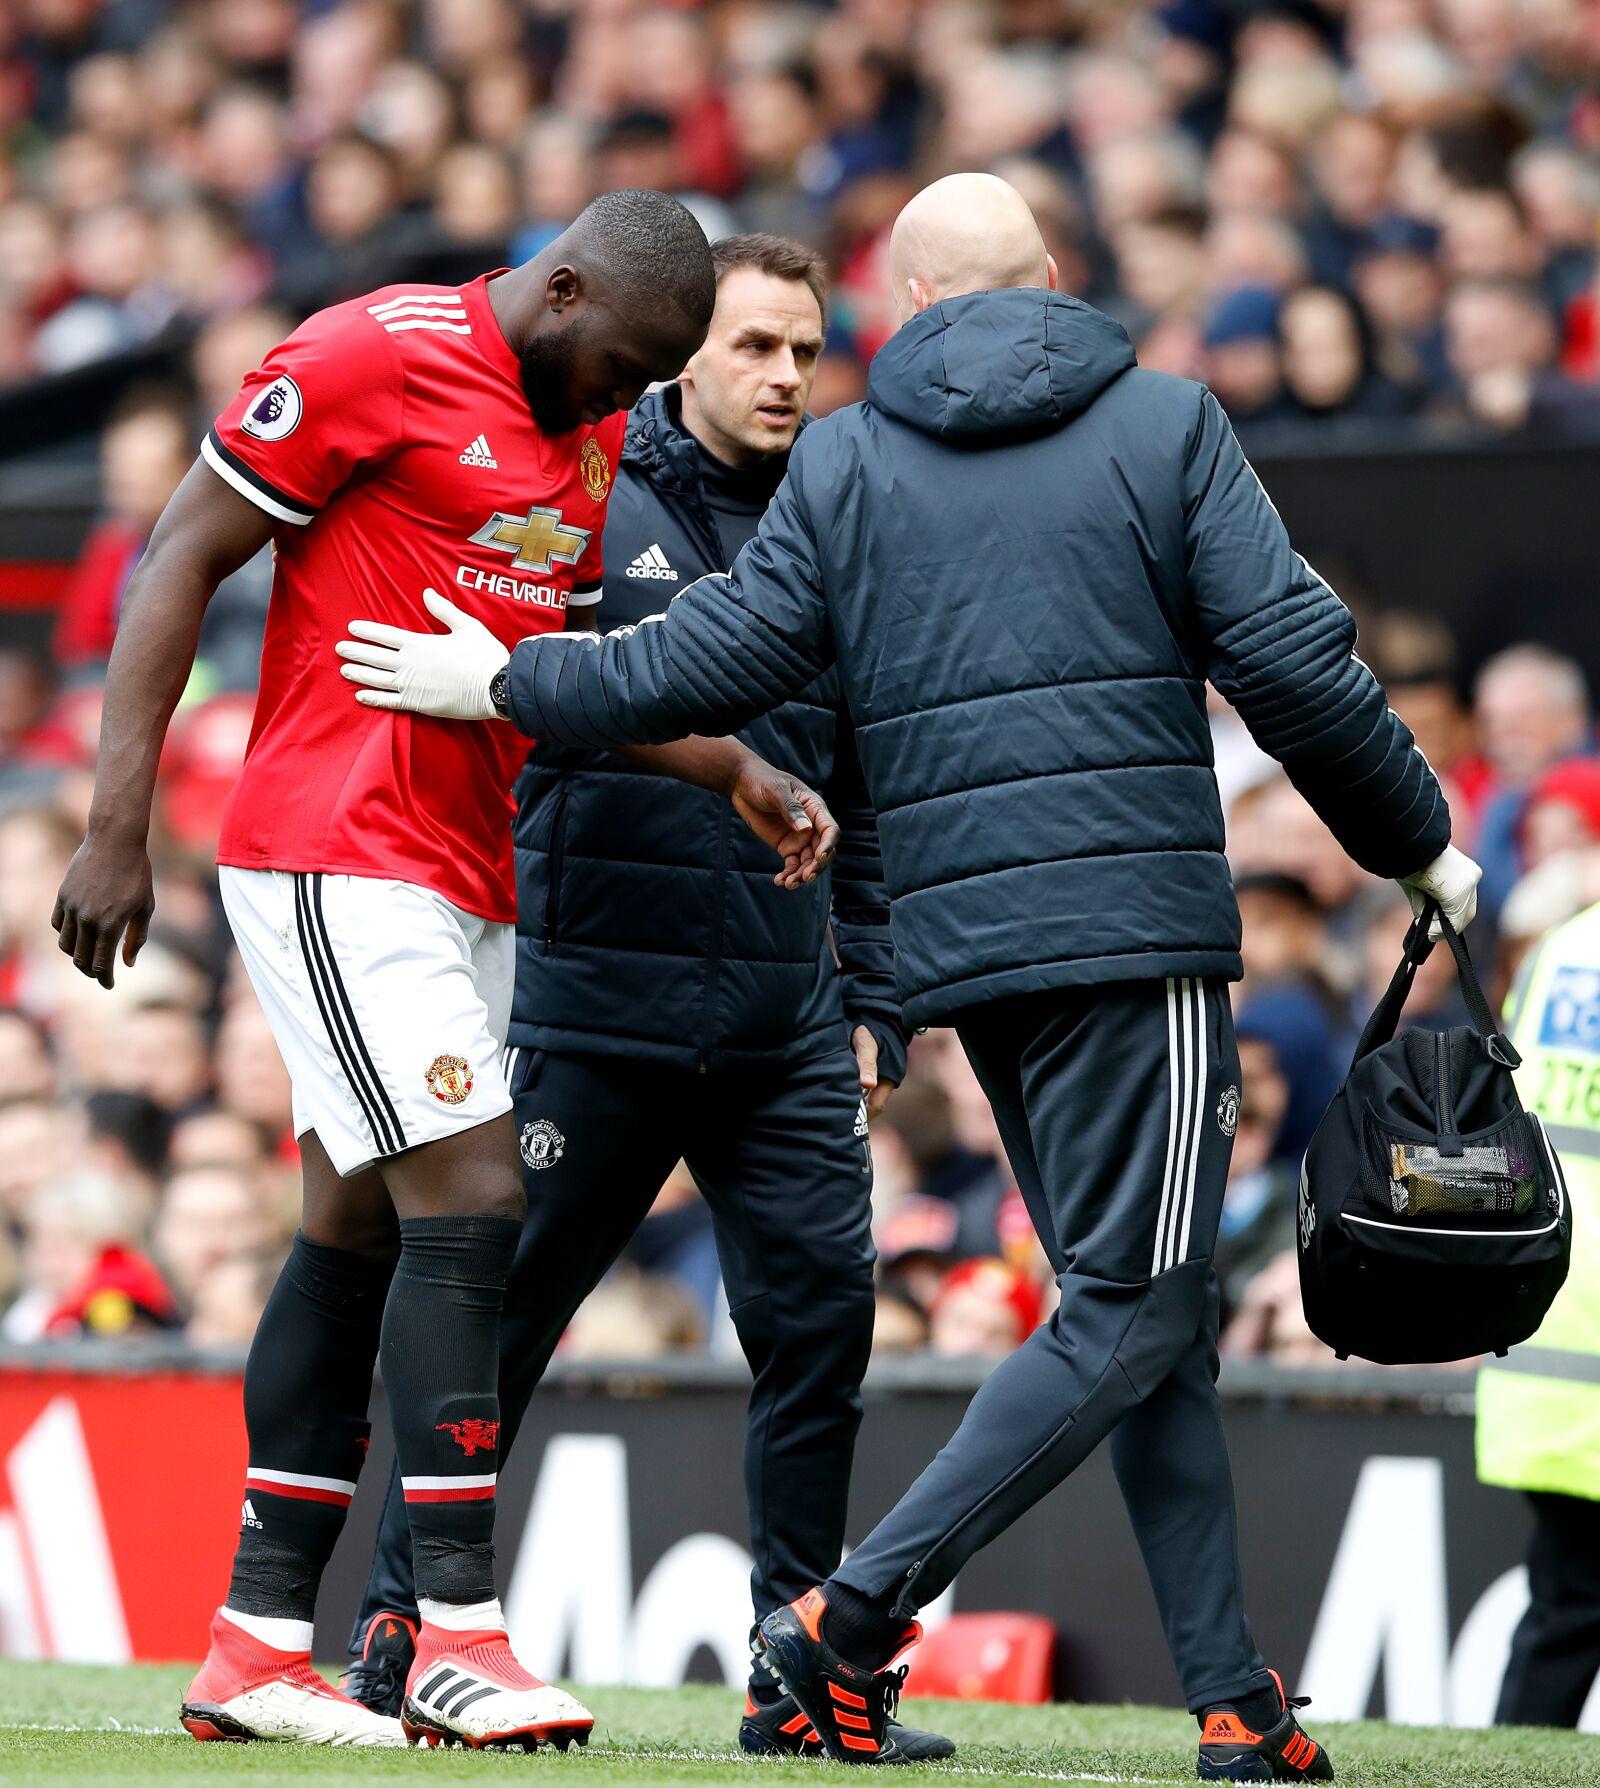 Romelu Lukaku Image 1: Manchester United: Romelu Lukaku Picks Up An Injury In 2-1